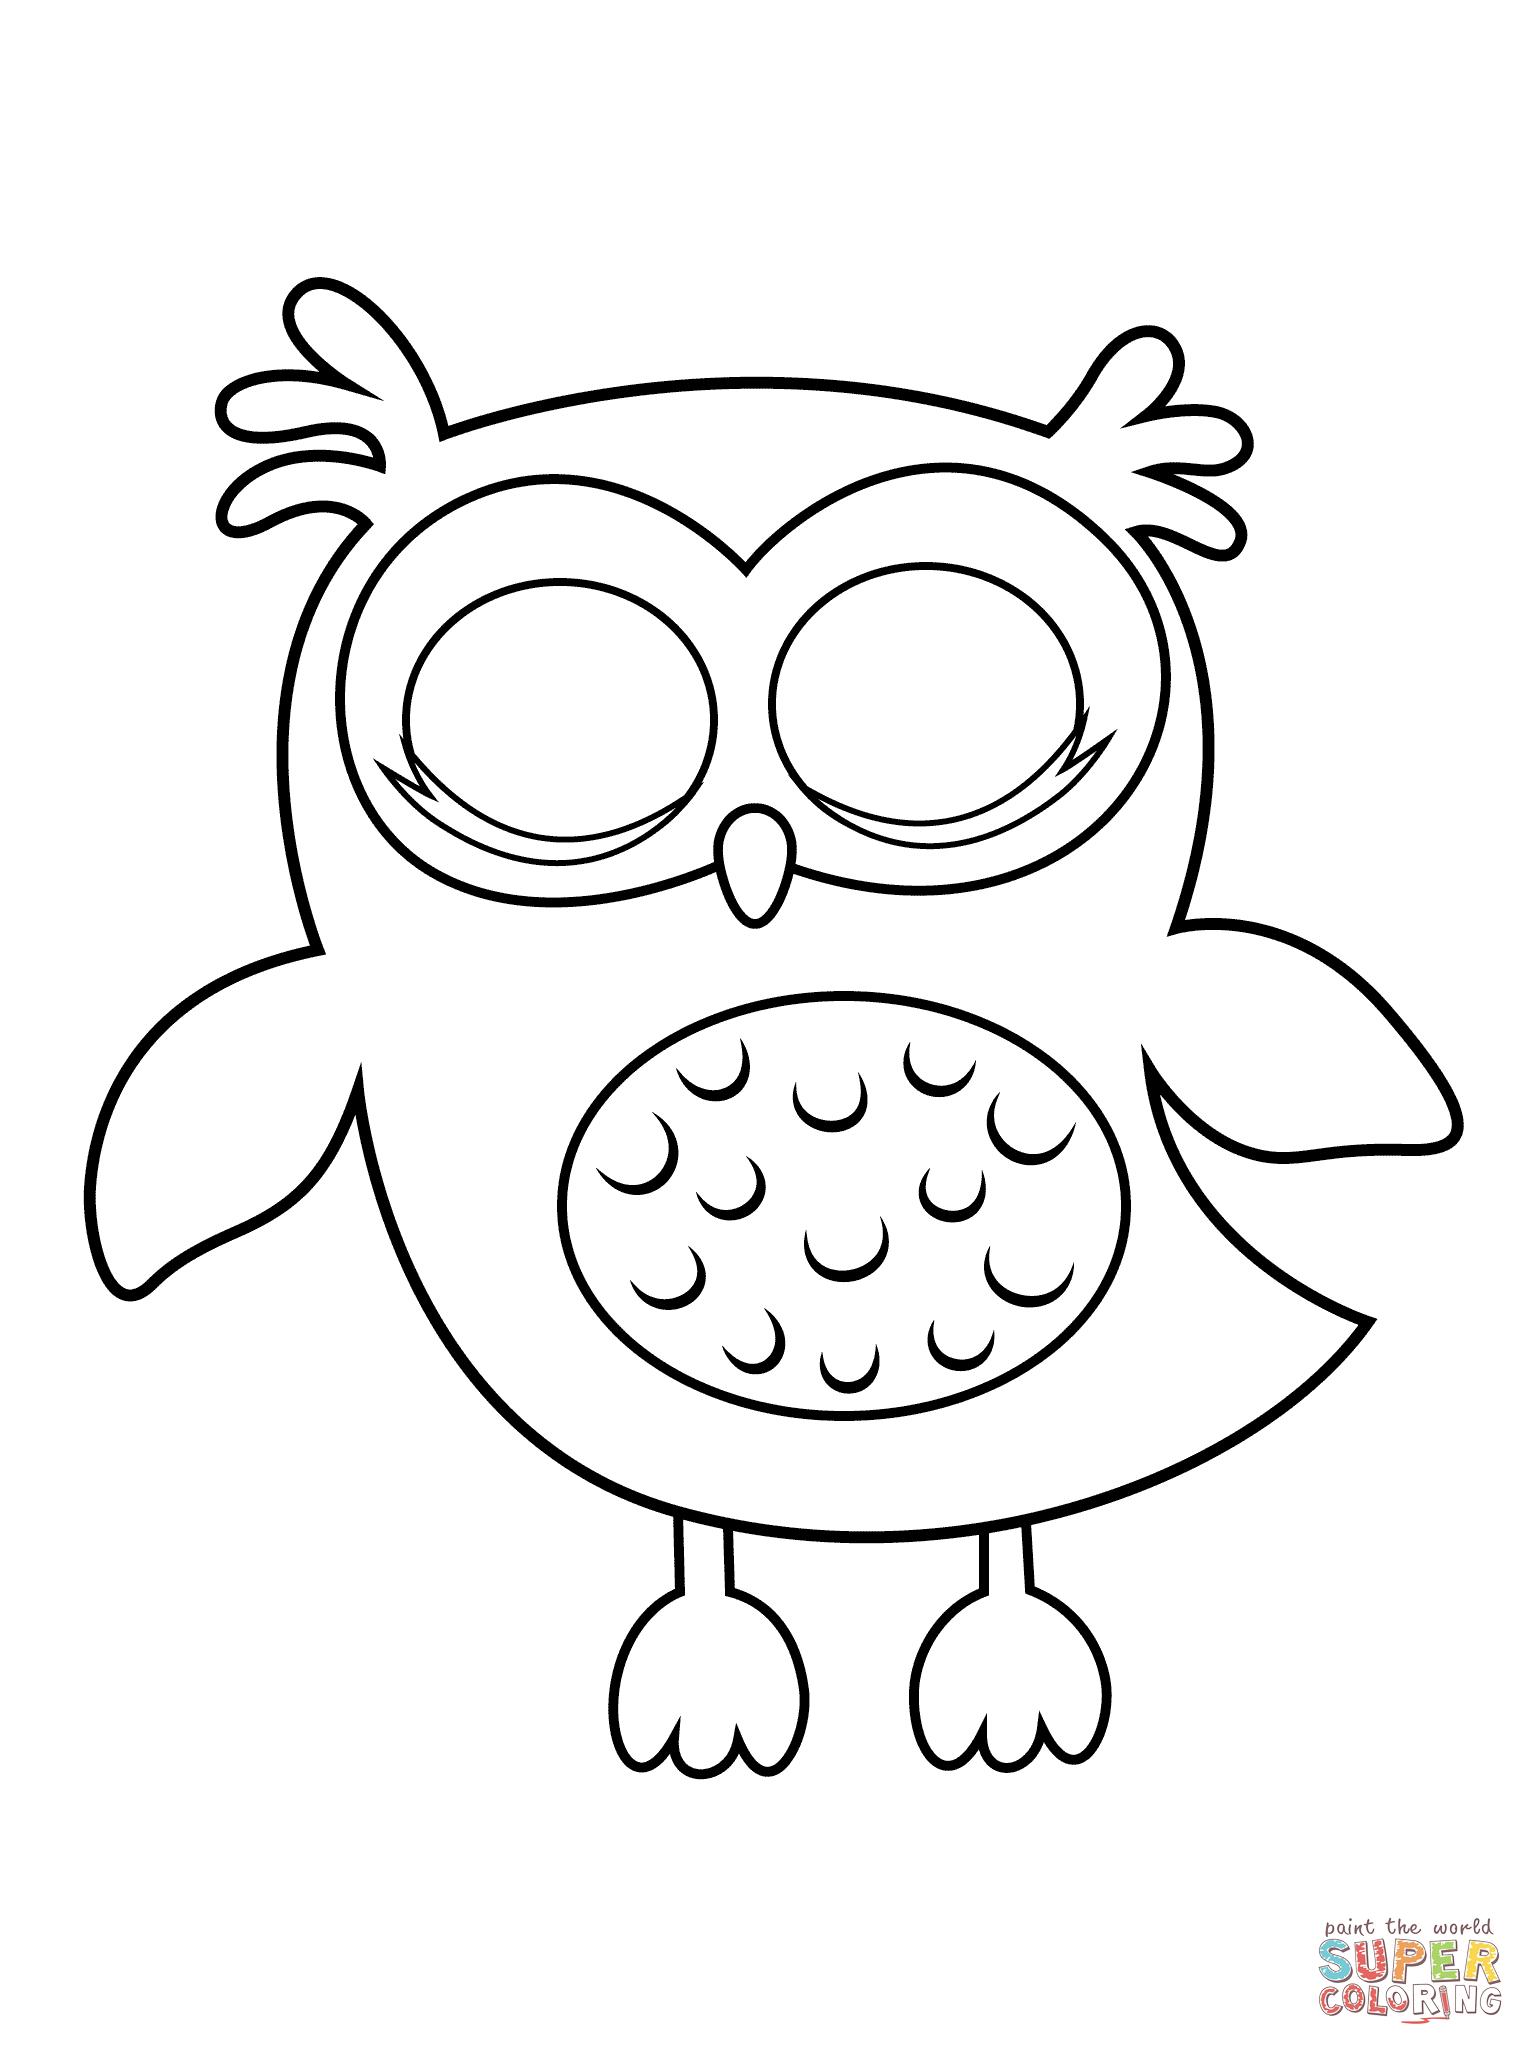 Sleepy Owl Coloring Page